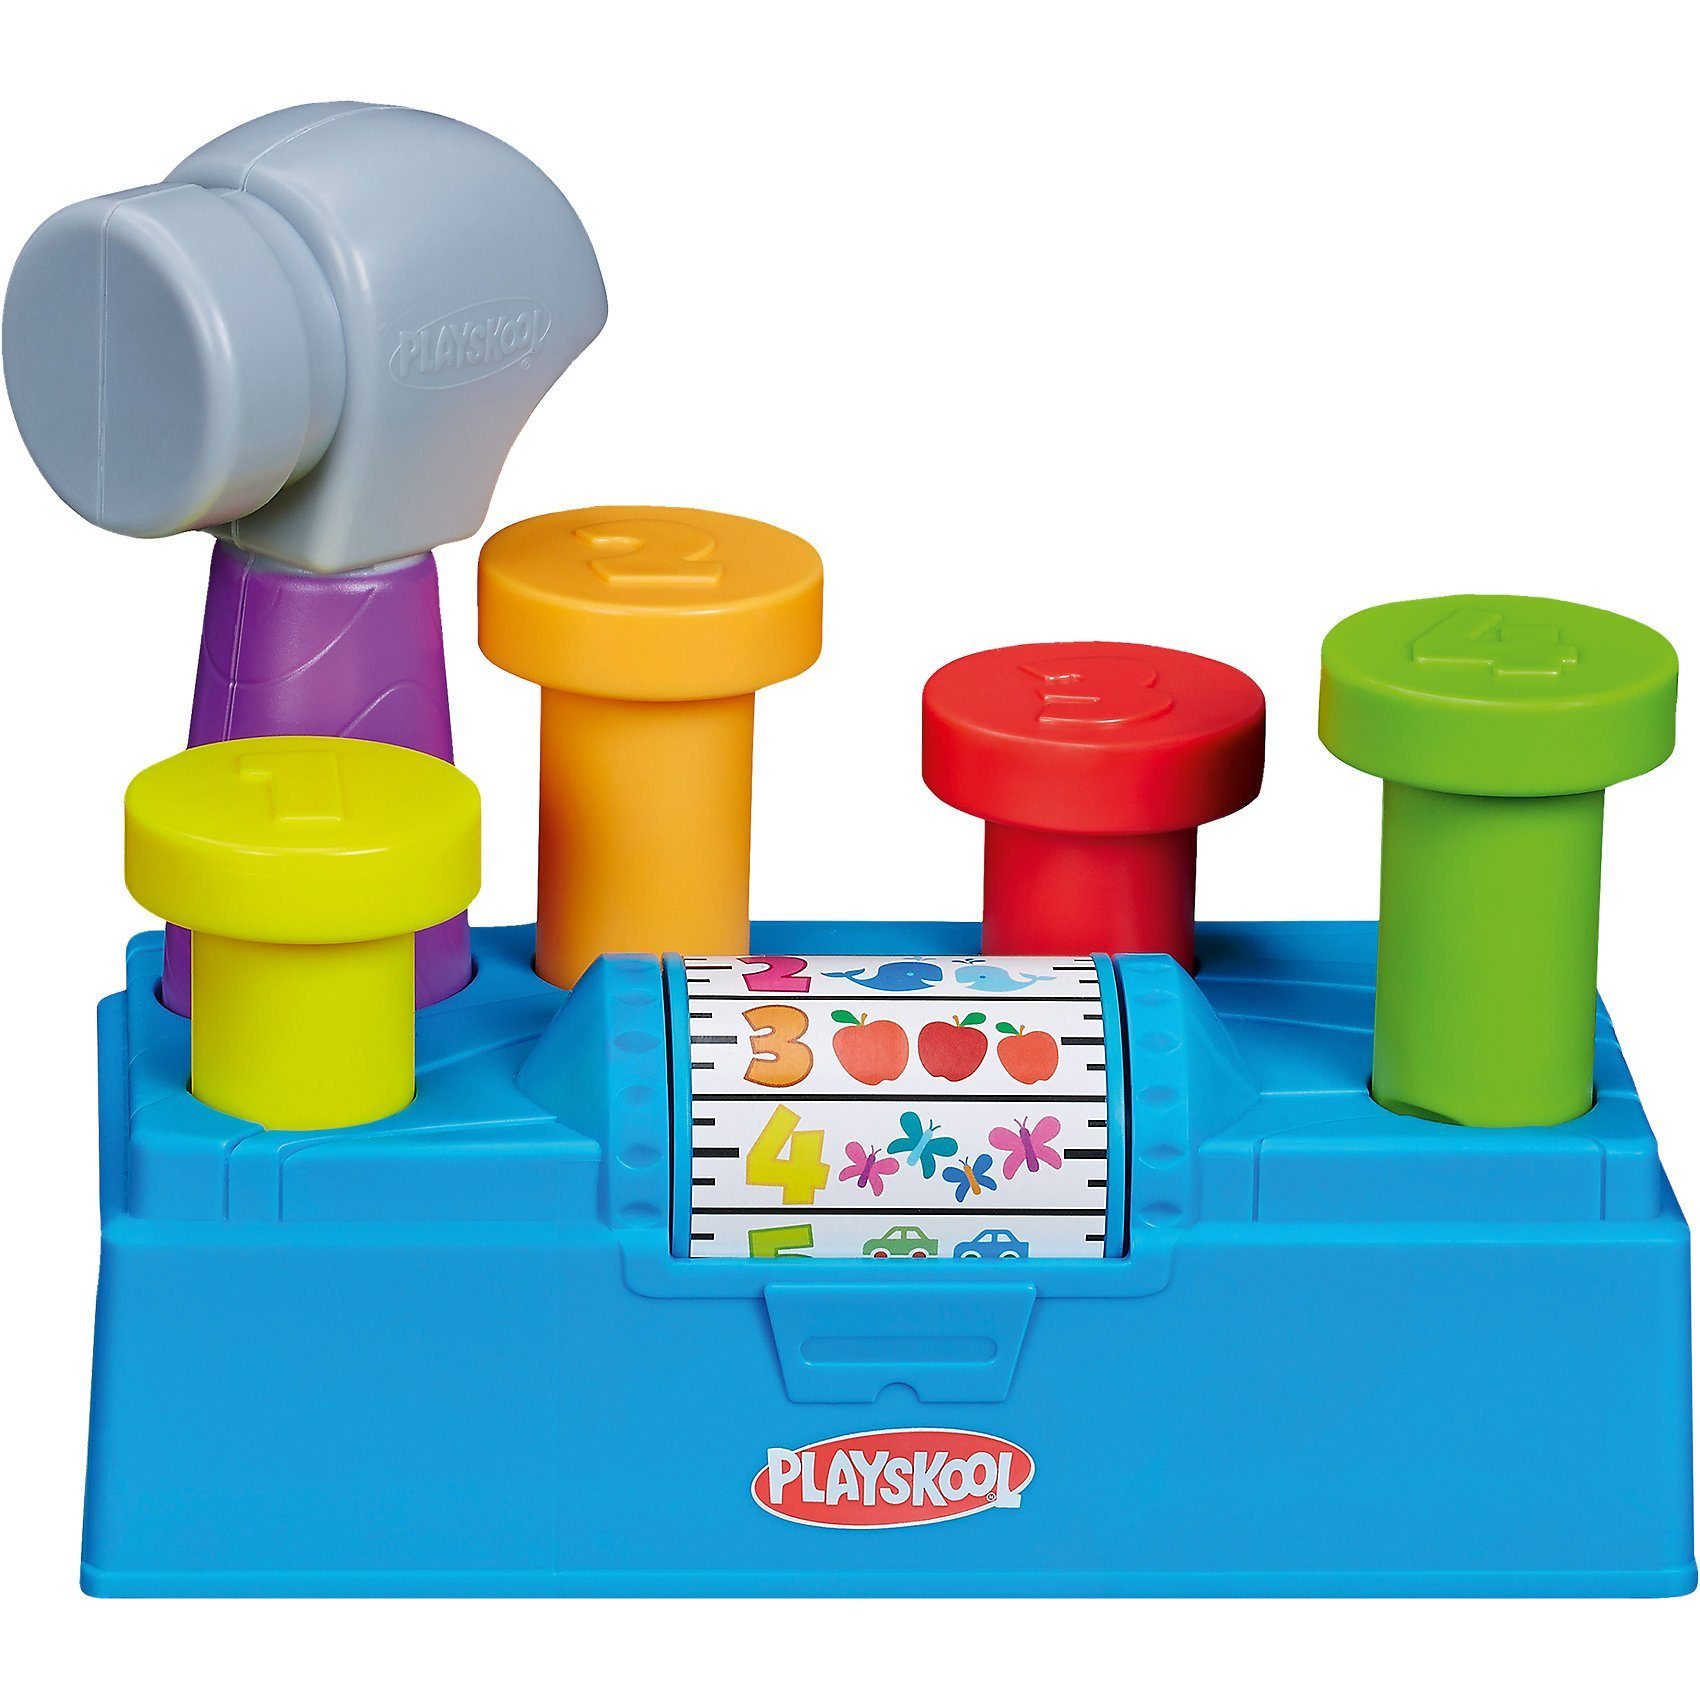 Hasbro Playskool - Hämmerchen Klopfbank